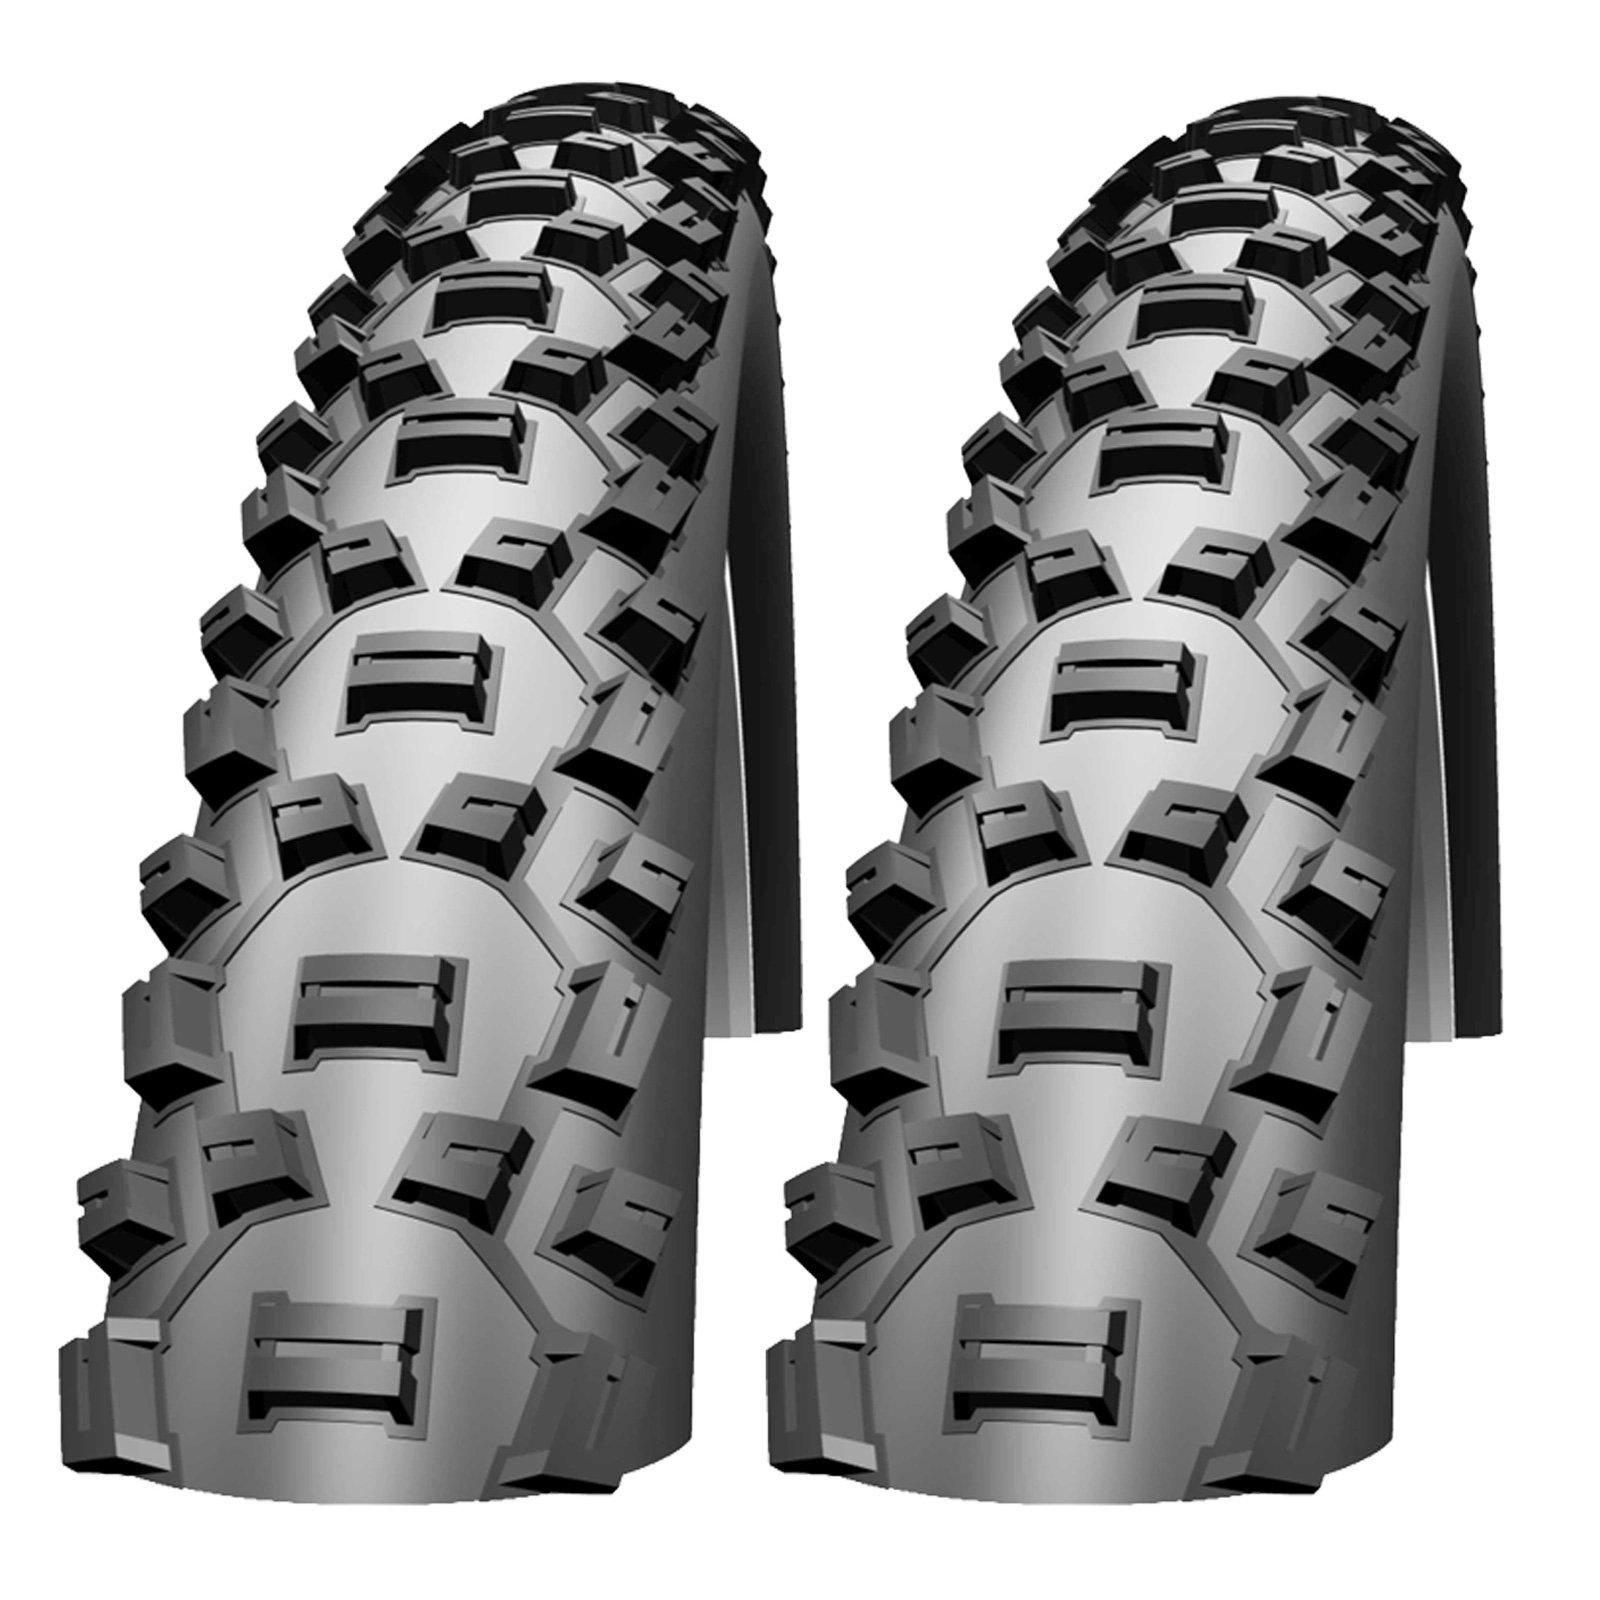 Schwalbe Nobby Nic 26'' x 2.25 Mountain Bike Performance Tyres (Pair)